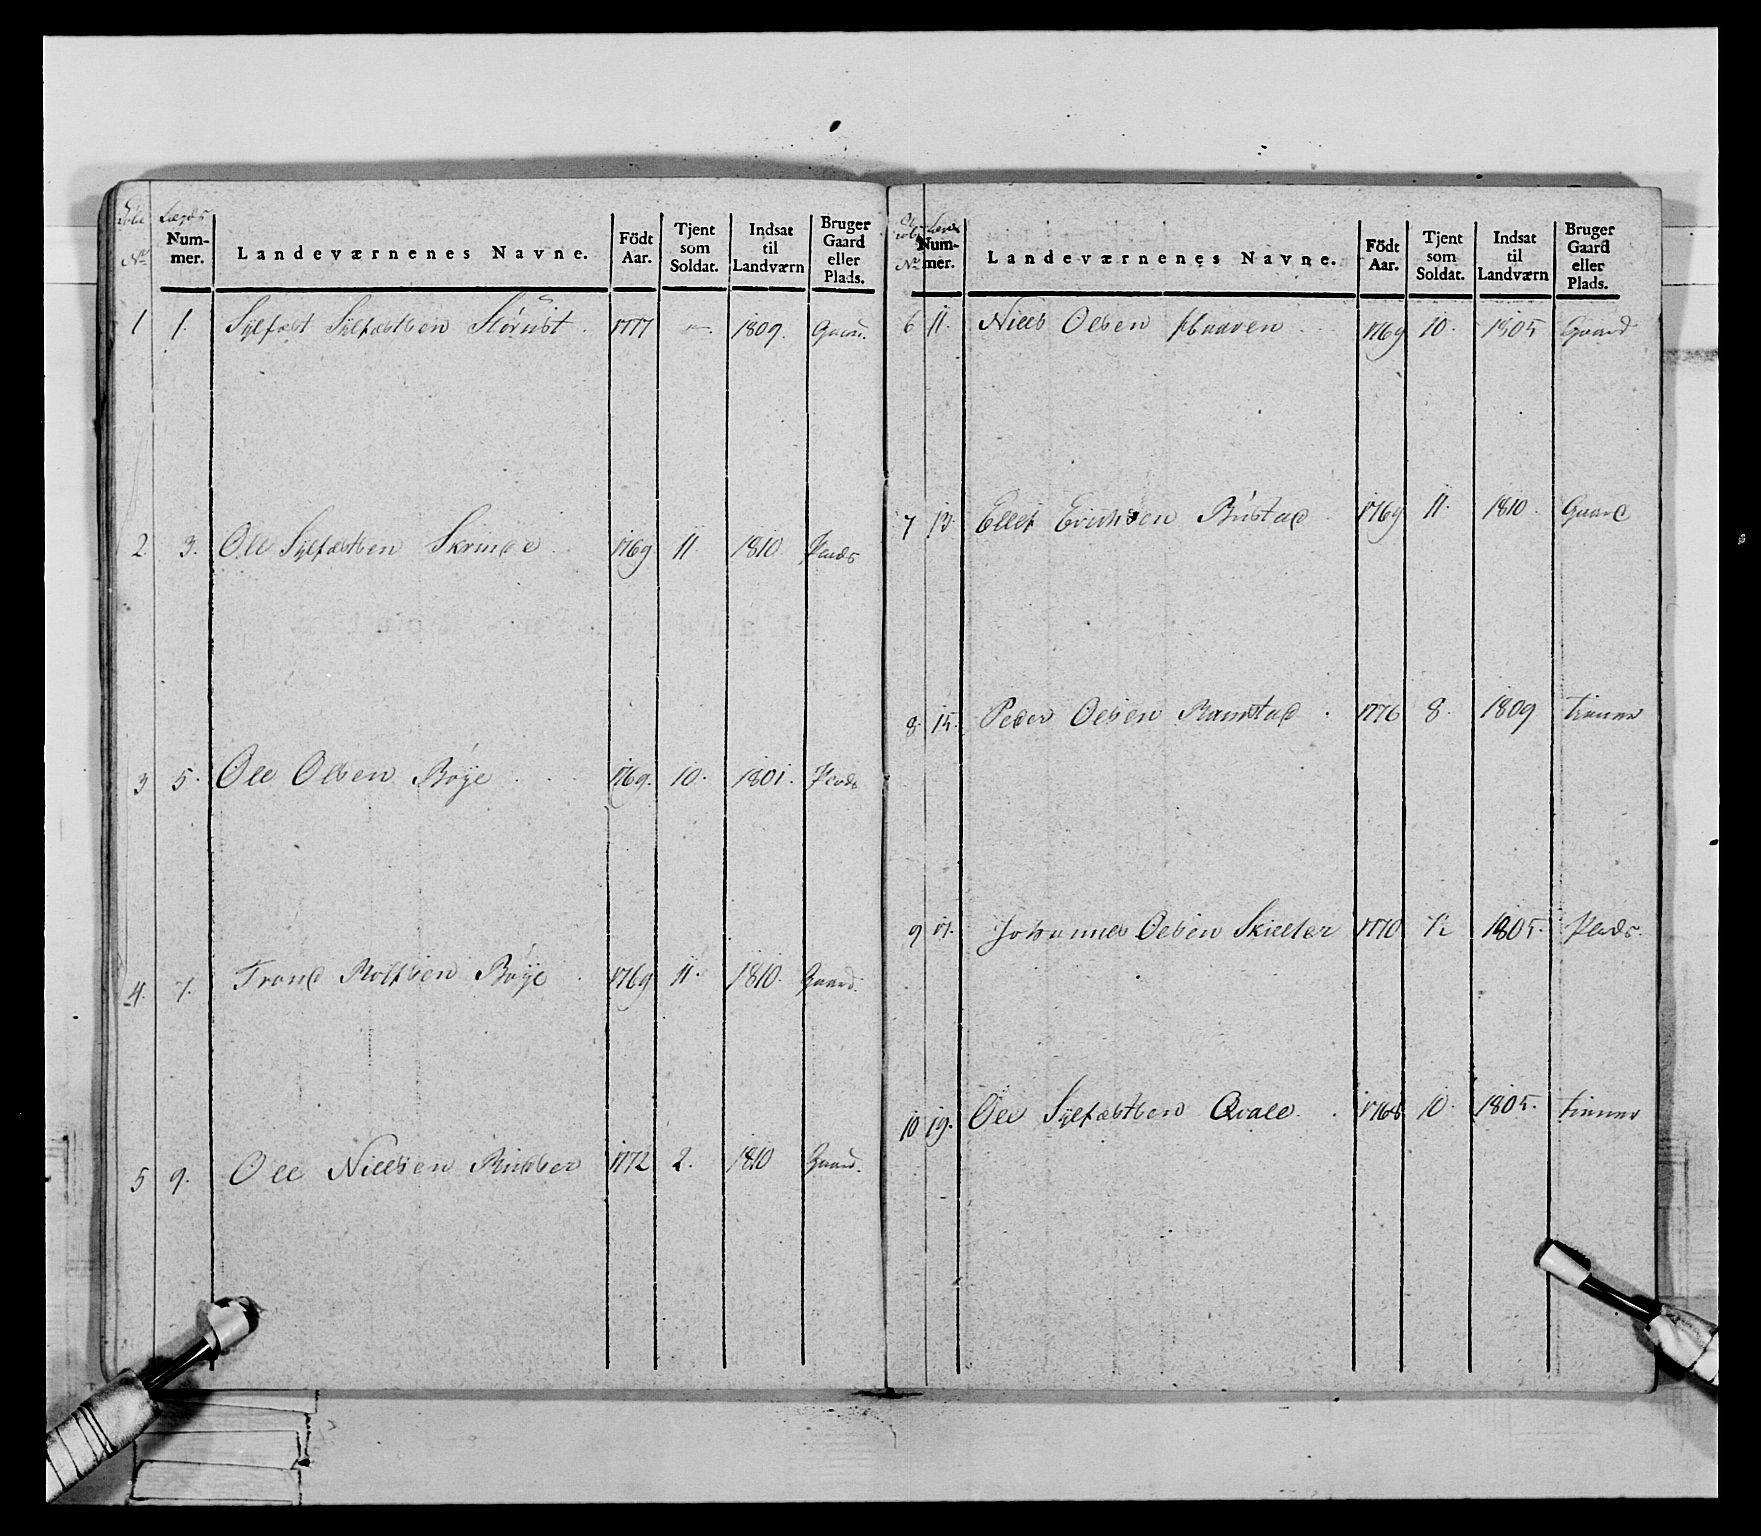 RA, Generalitets- og kommissariatskollegiet, Det kongelige norske kommissariatskollegium, E/Eh/L0069: Opplandske gevorbne infanteriregiment, 1810-1818, s. 646